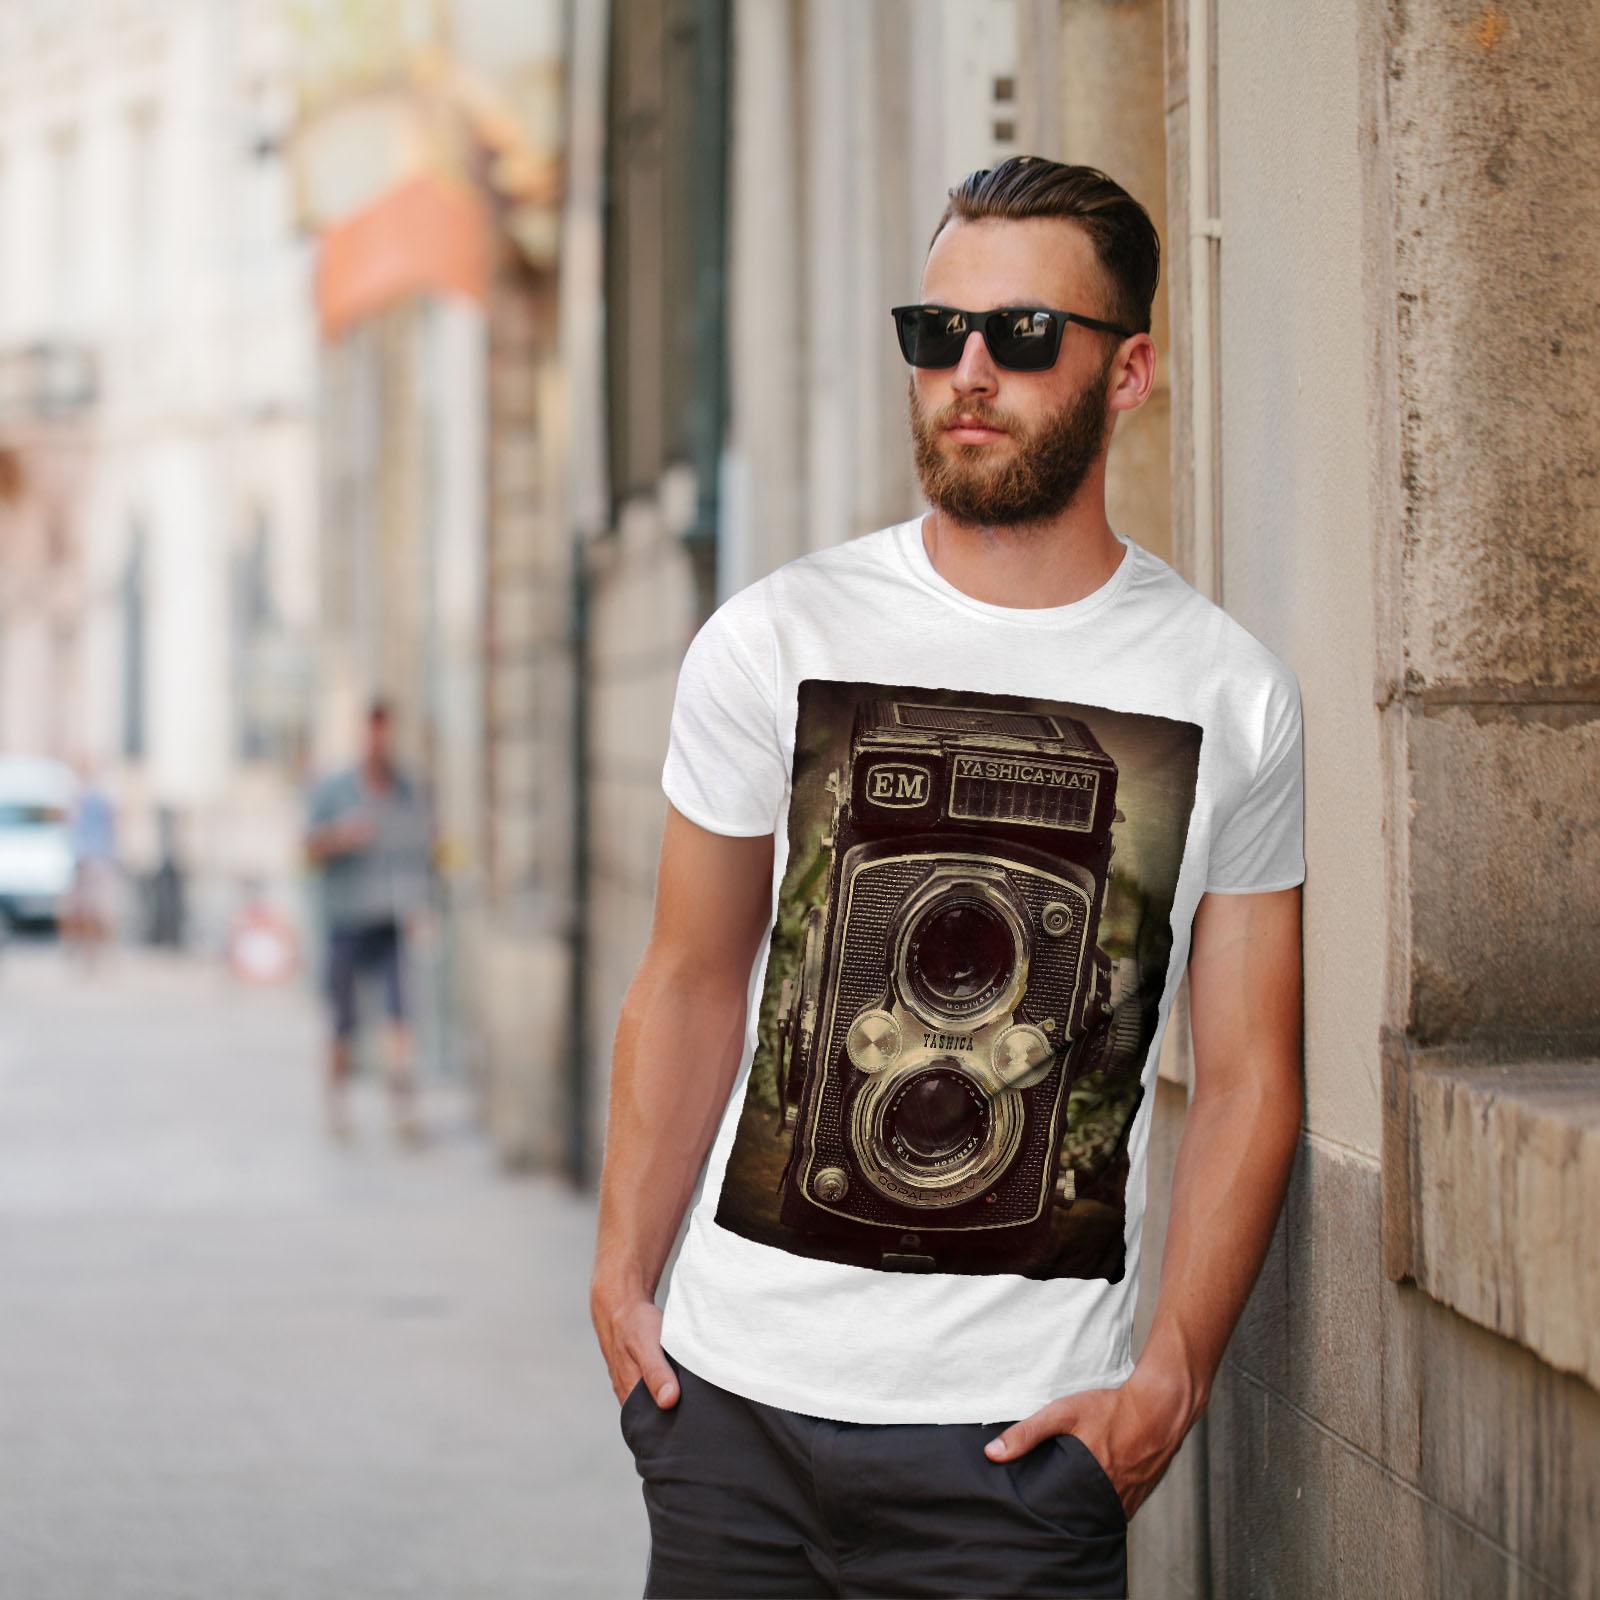 Wellcoda-Old-Foto-Camera-Mens-T-shirt-Retro-Graphic-Design-Printed-Tee thumbnail 11